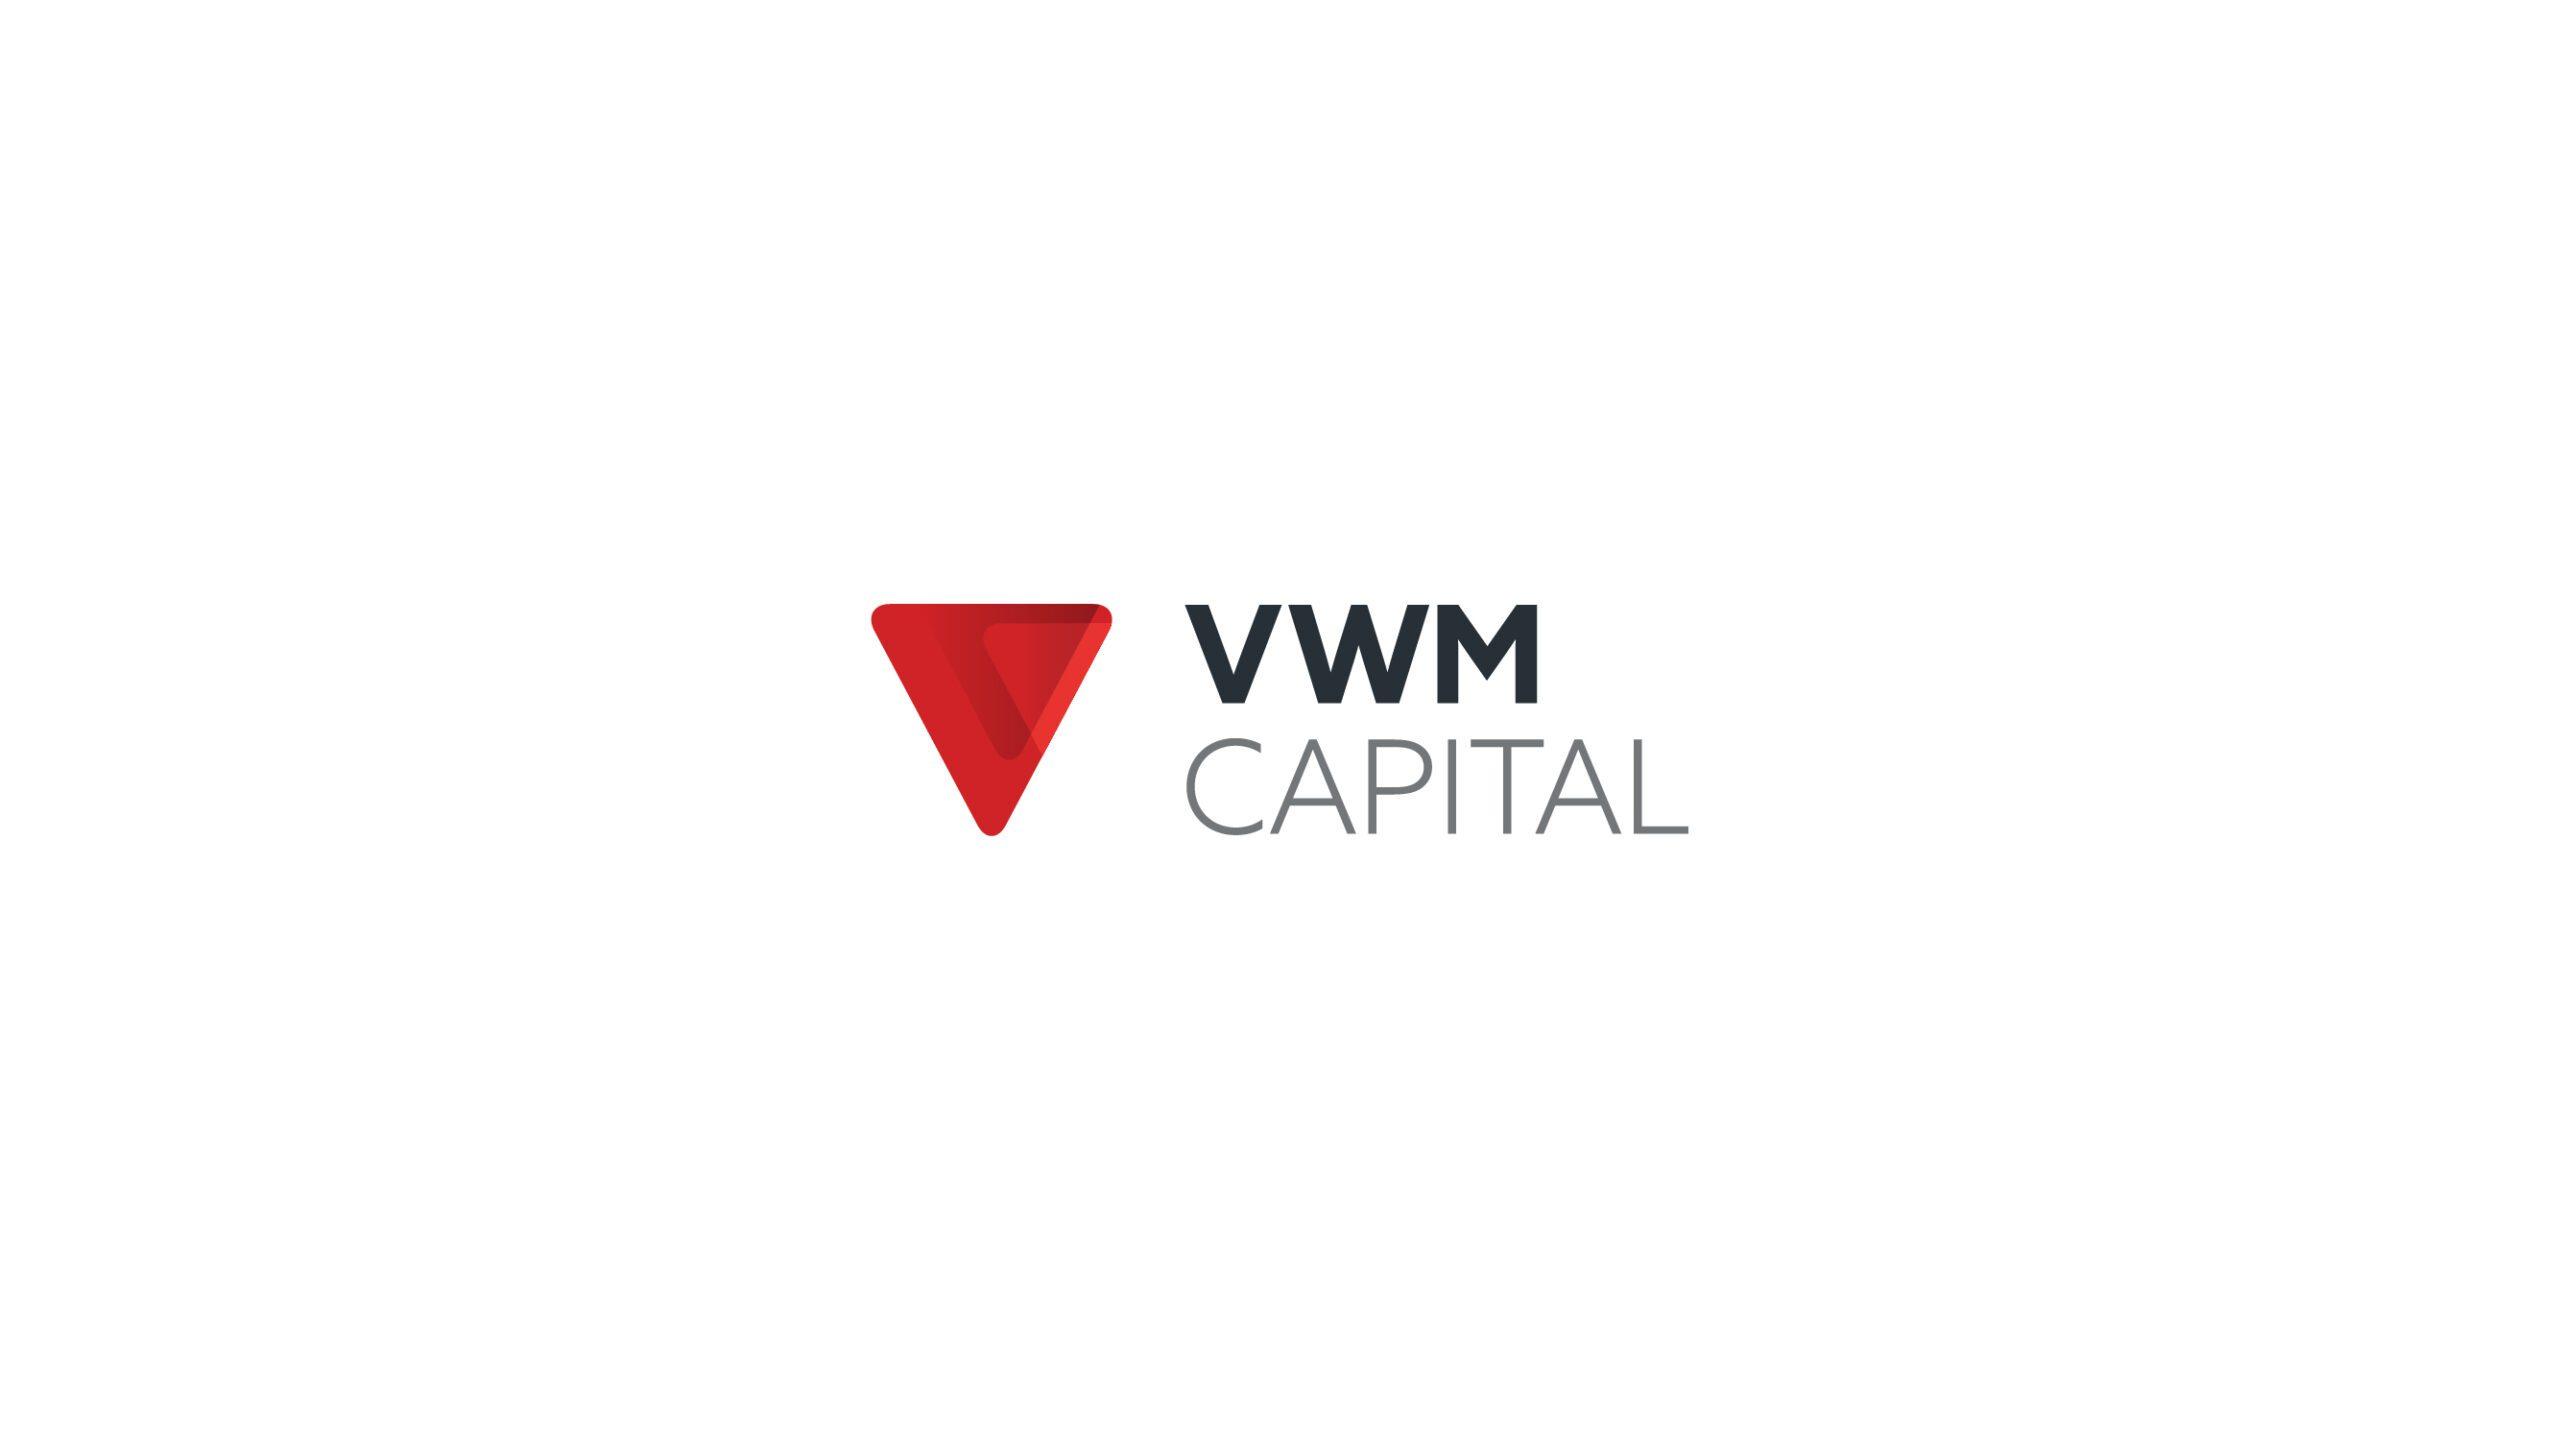 VWM Capital